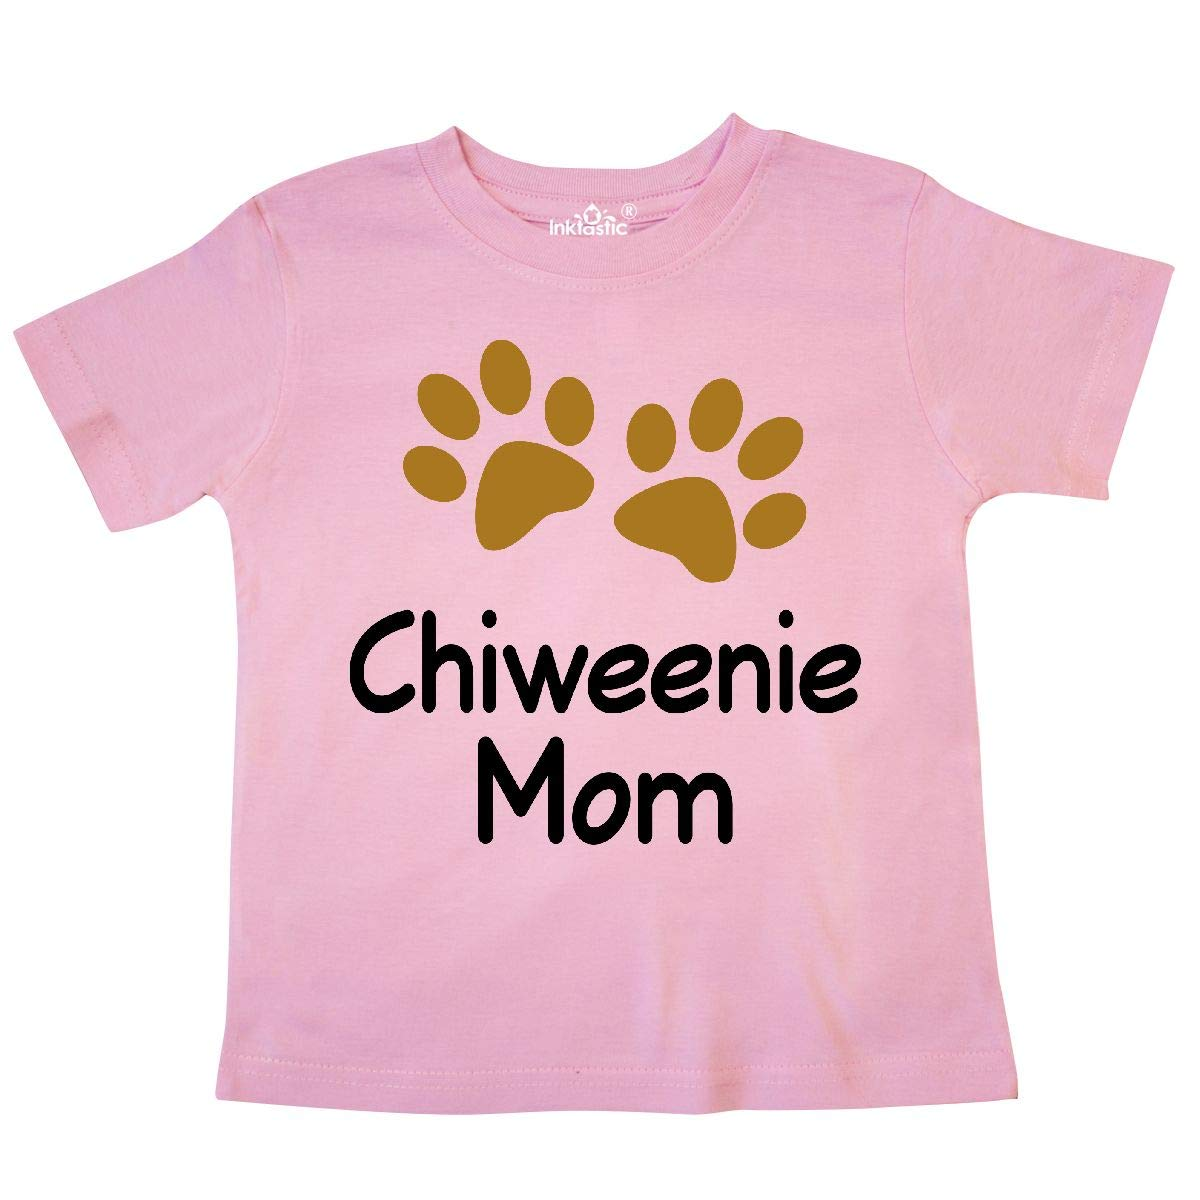 inktastic Chiweenie Mom Paw Print Toddler T-Shirt